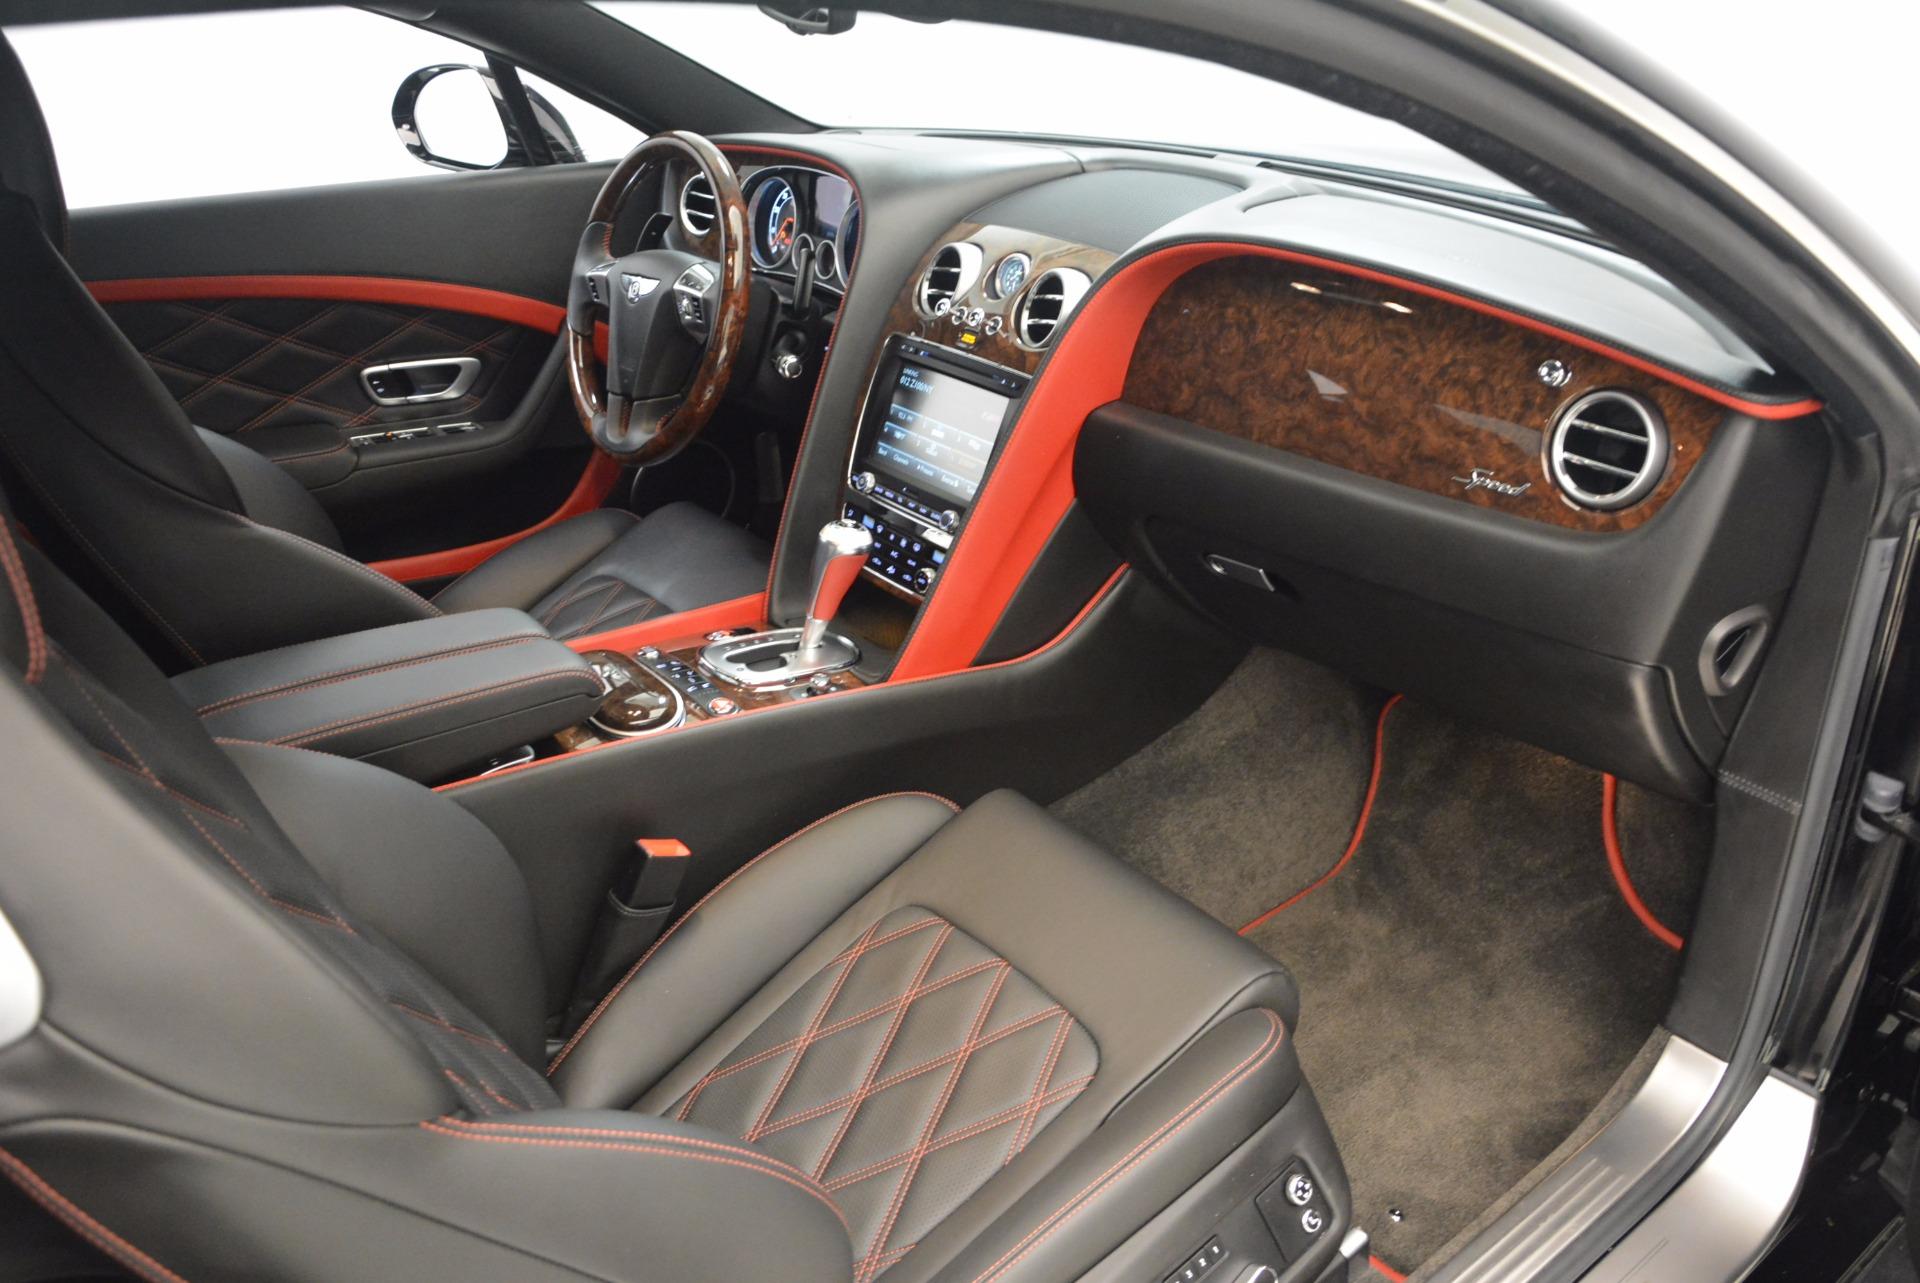 Used 2015 Bentley Continental GT Speed For Sale In Westport, CT 1646_p35